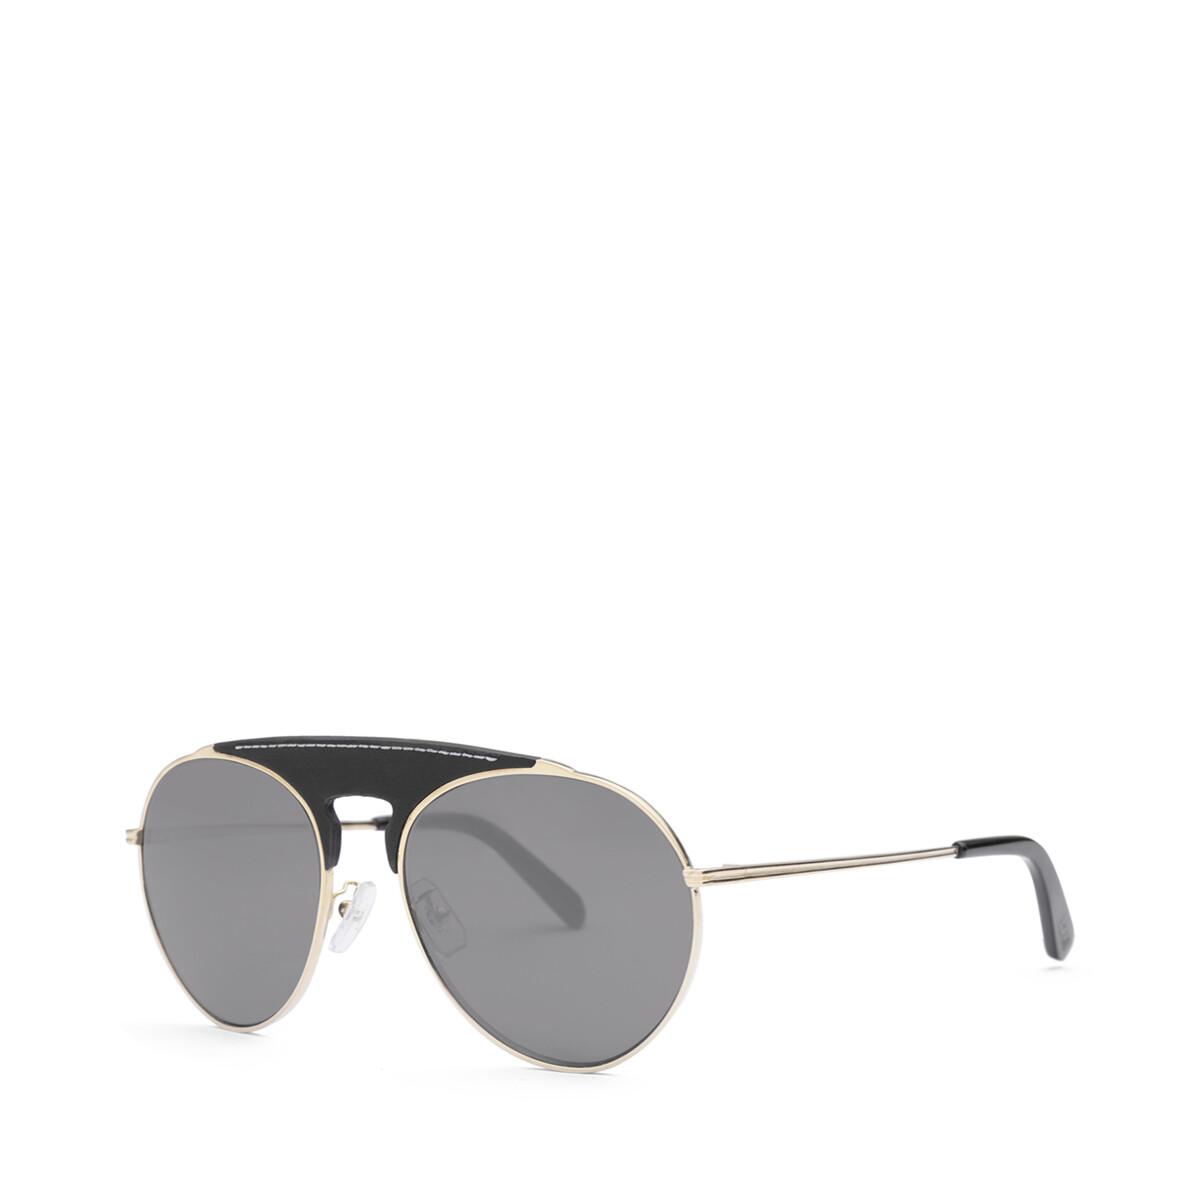 LOEWE Pilot Sunglasses Black/Smoke front